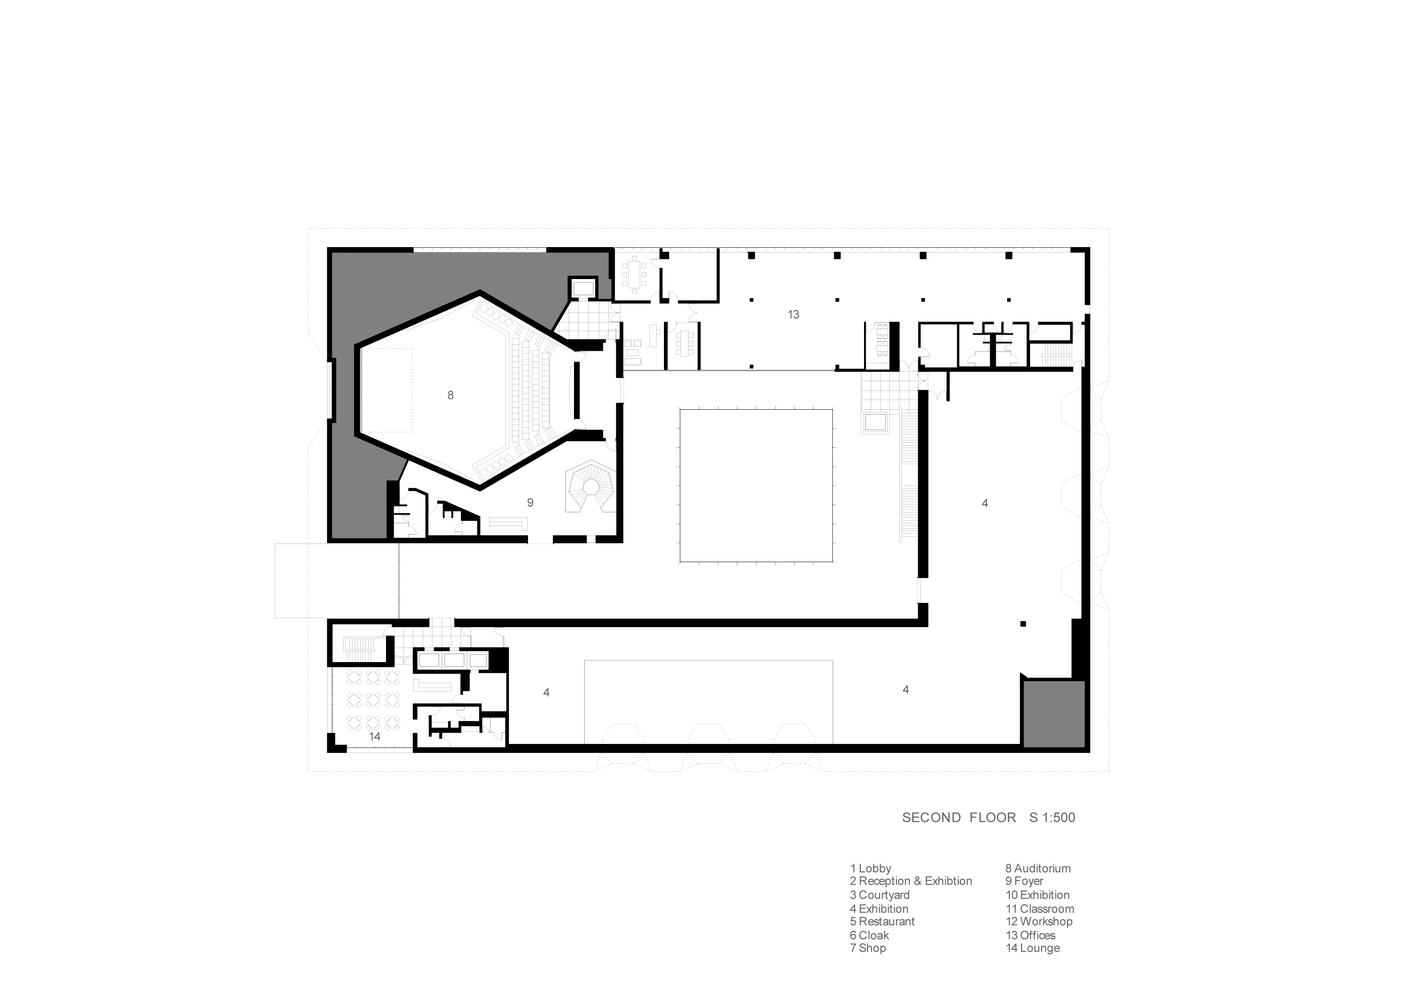 Gallery Of The Aga Khan Museum Maki And Associates 13